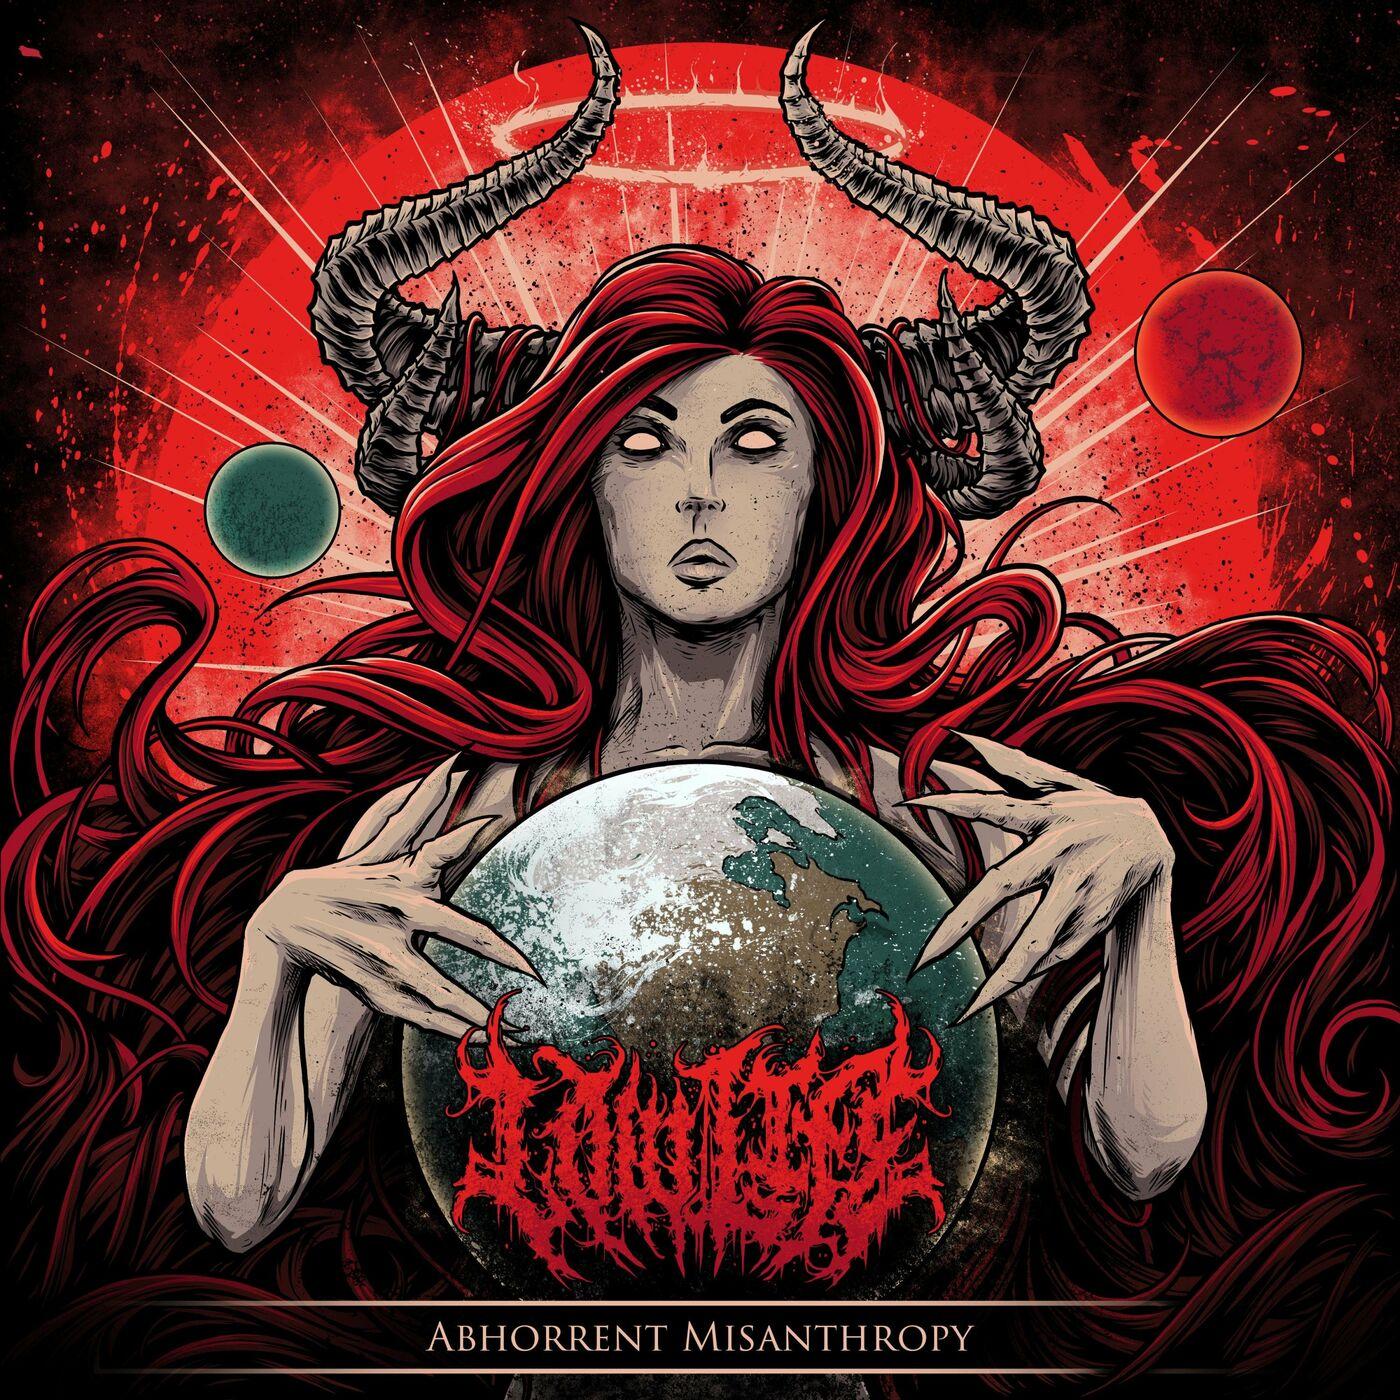 LowLife - Abhorrent Misanthropy [EP] (2021)